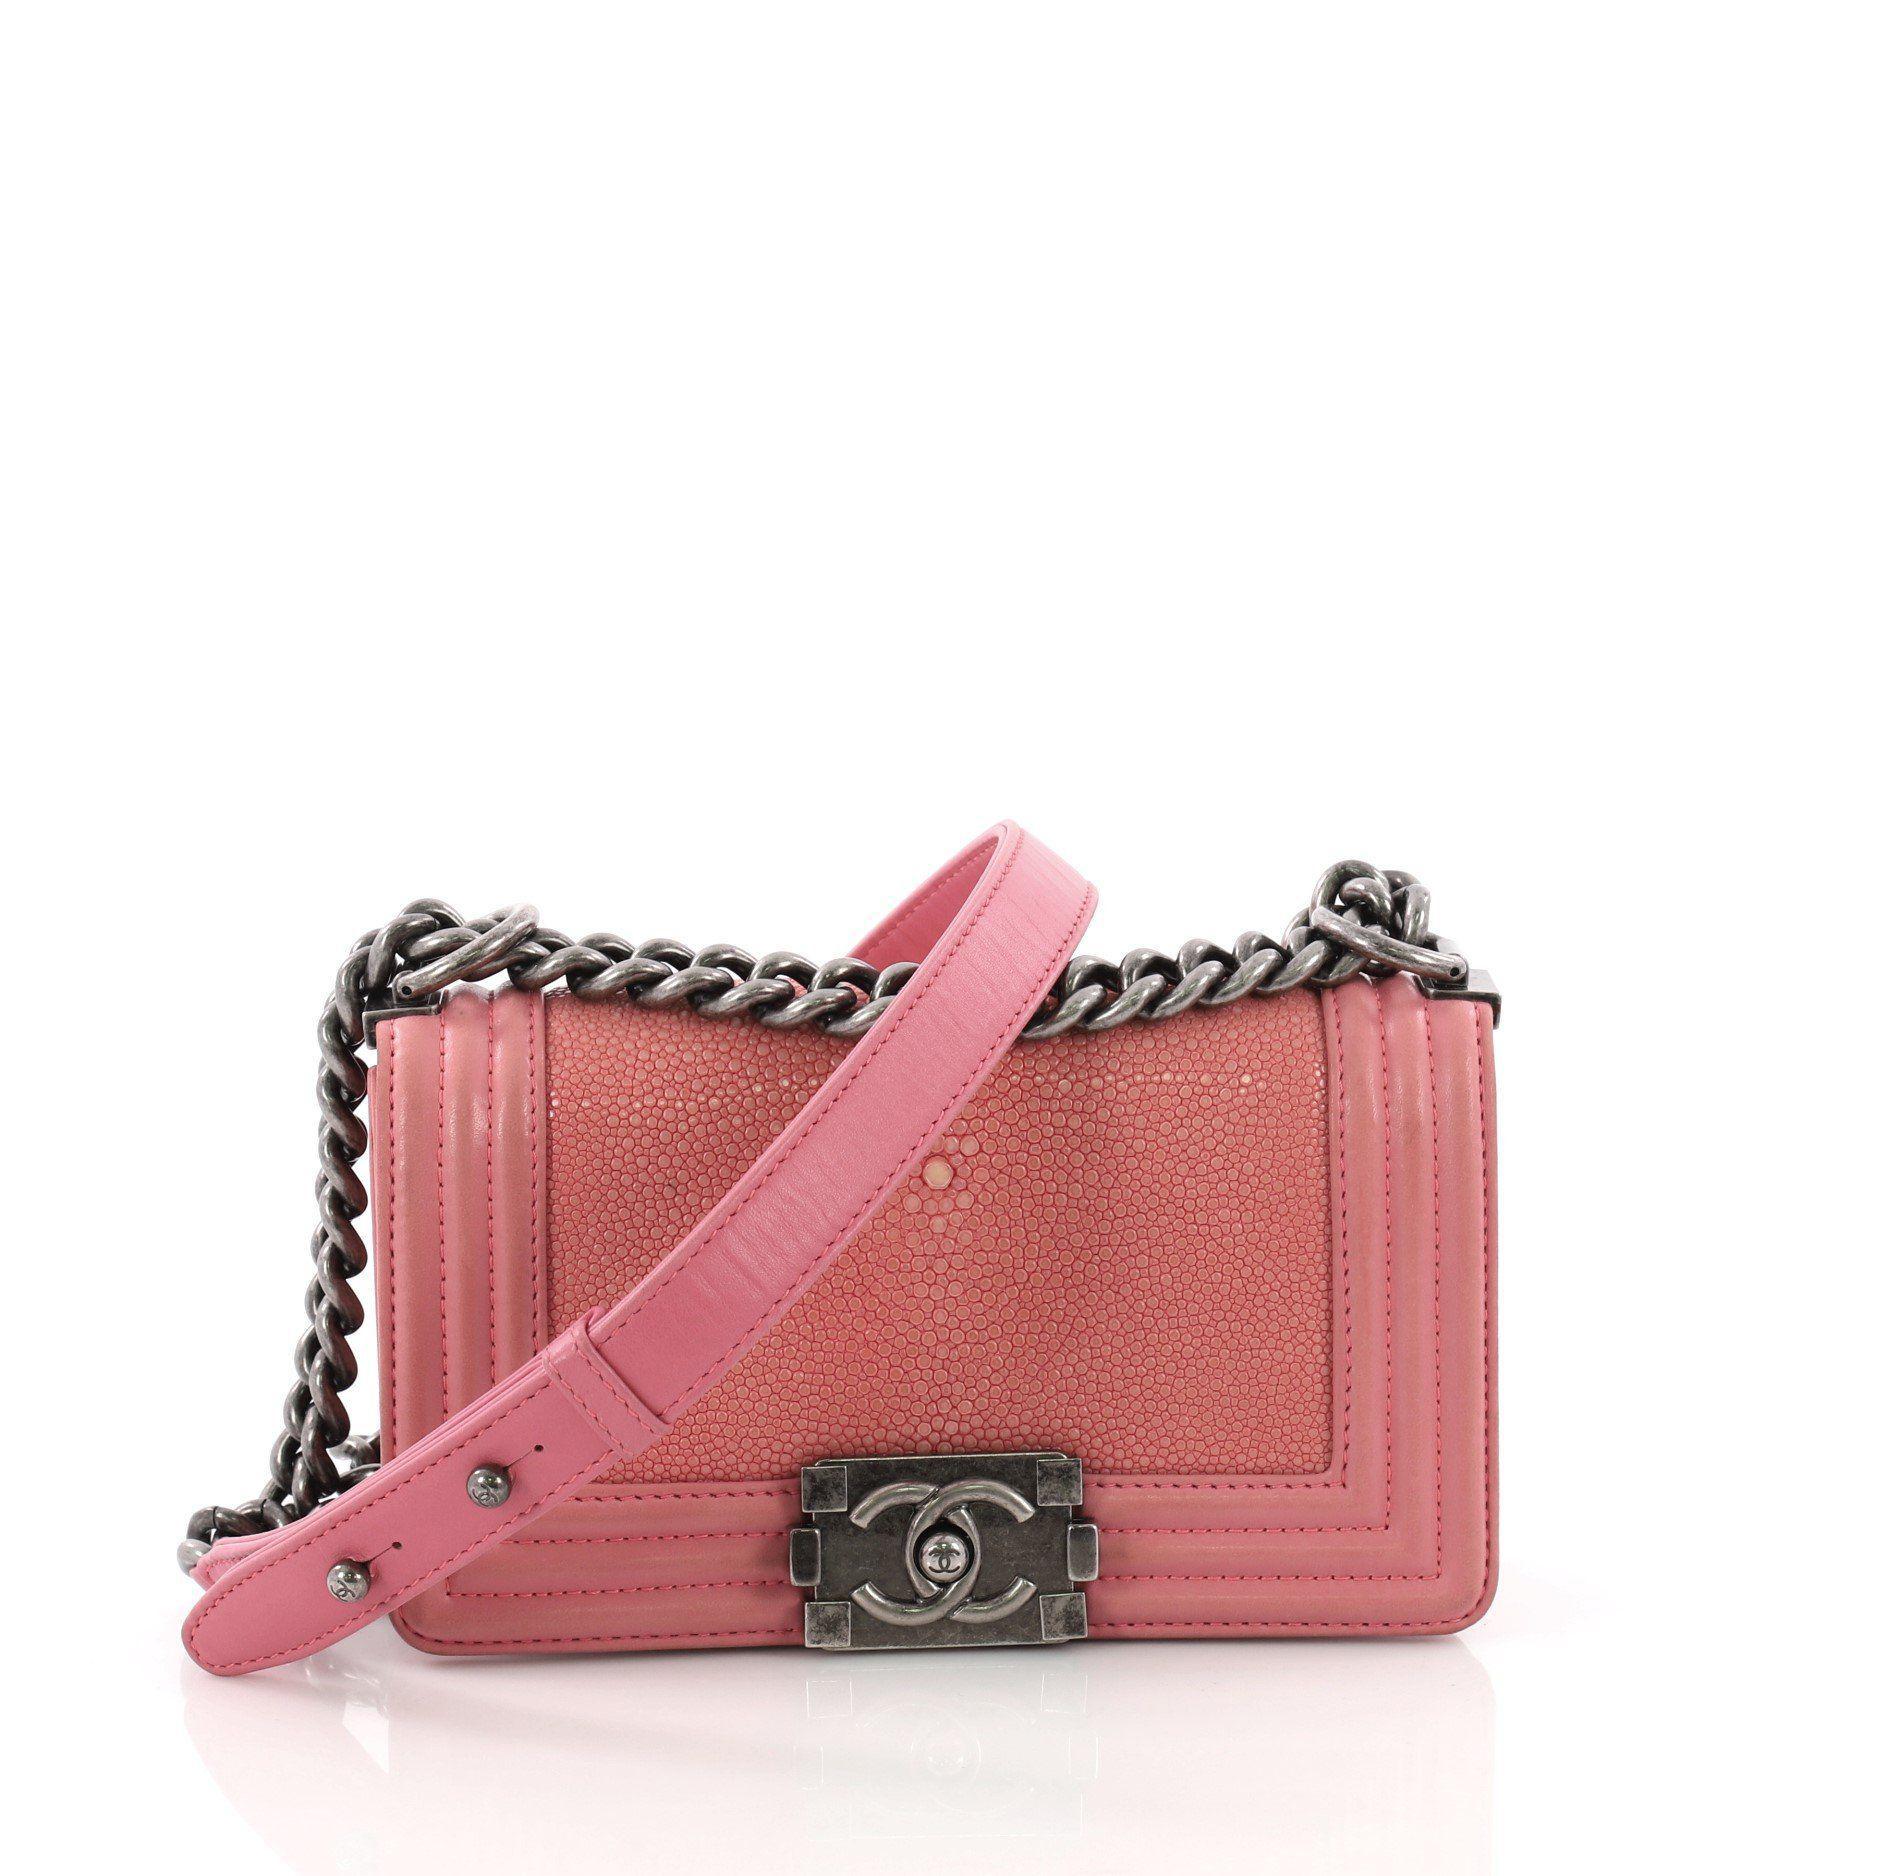 98294dee2e3a Chanel. Women's Pre Owned Boy Flap Bag Stingray Small